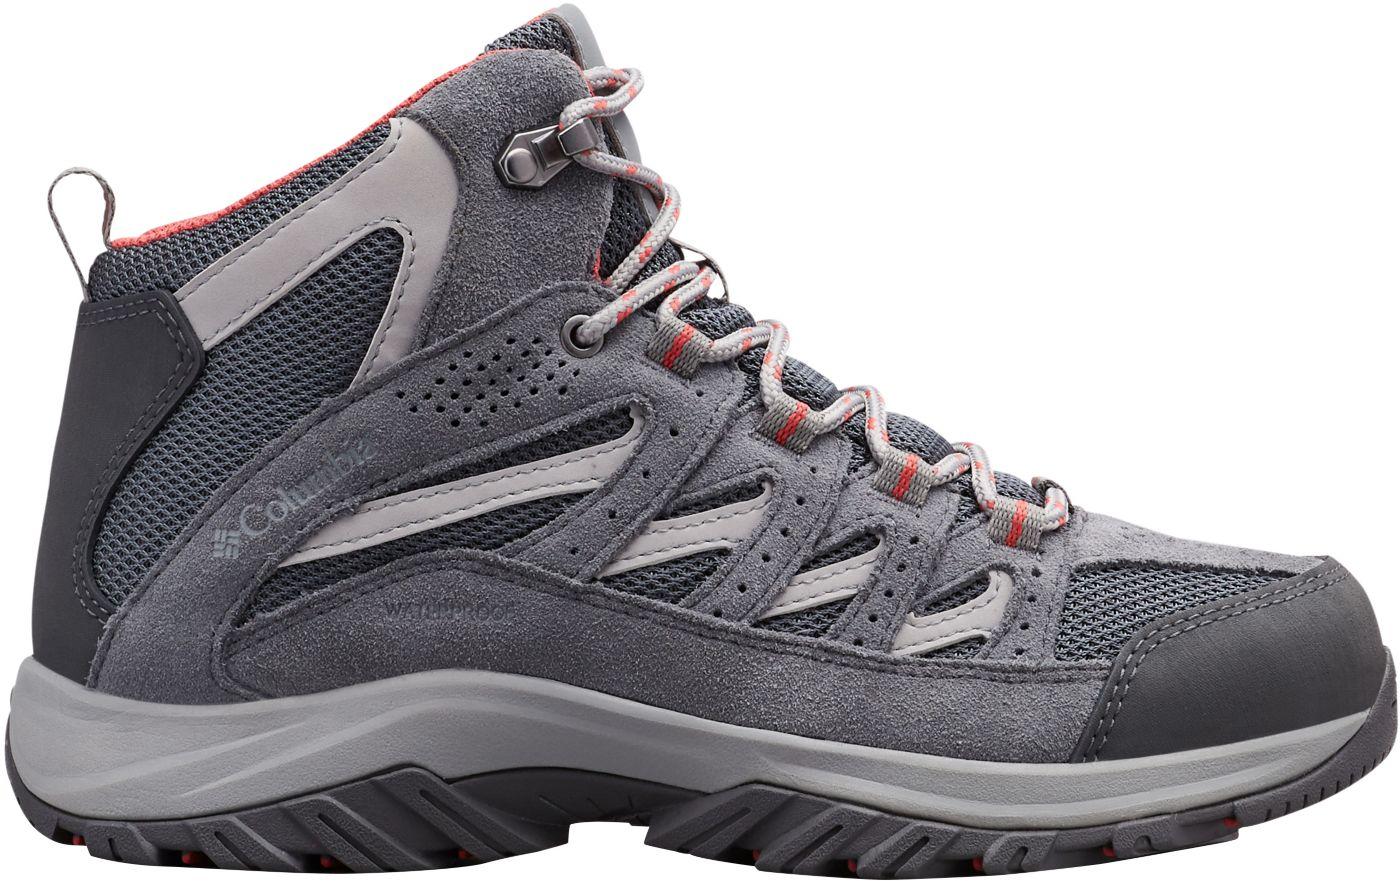 Columbia Women's Crestwood Mid Waterproof Hiking Boots